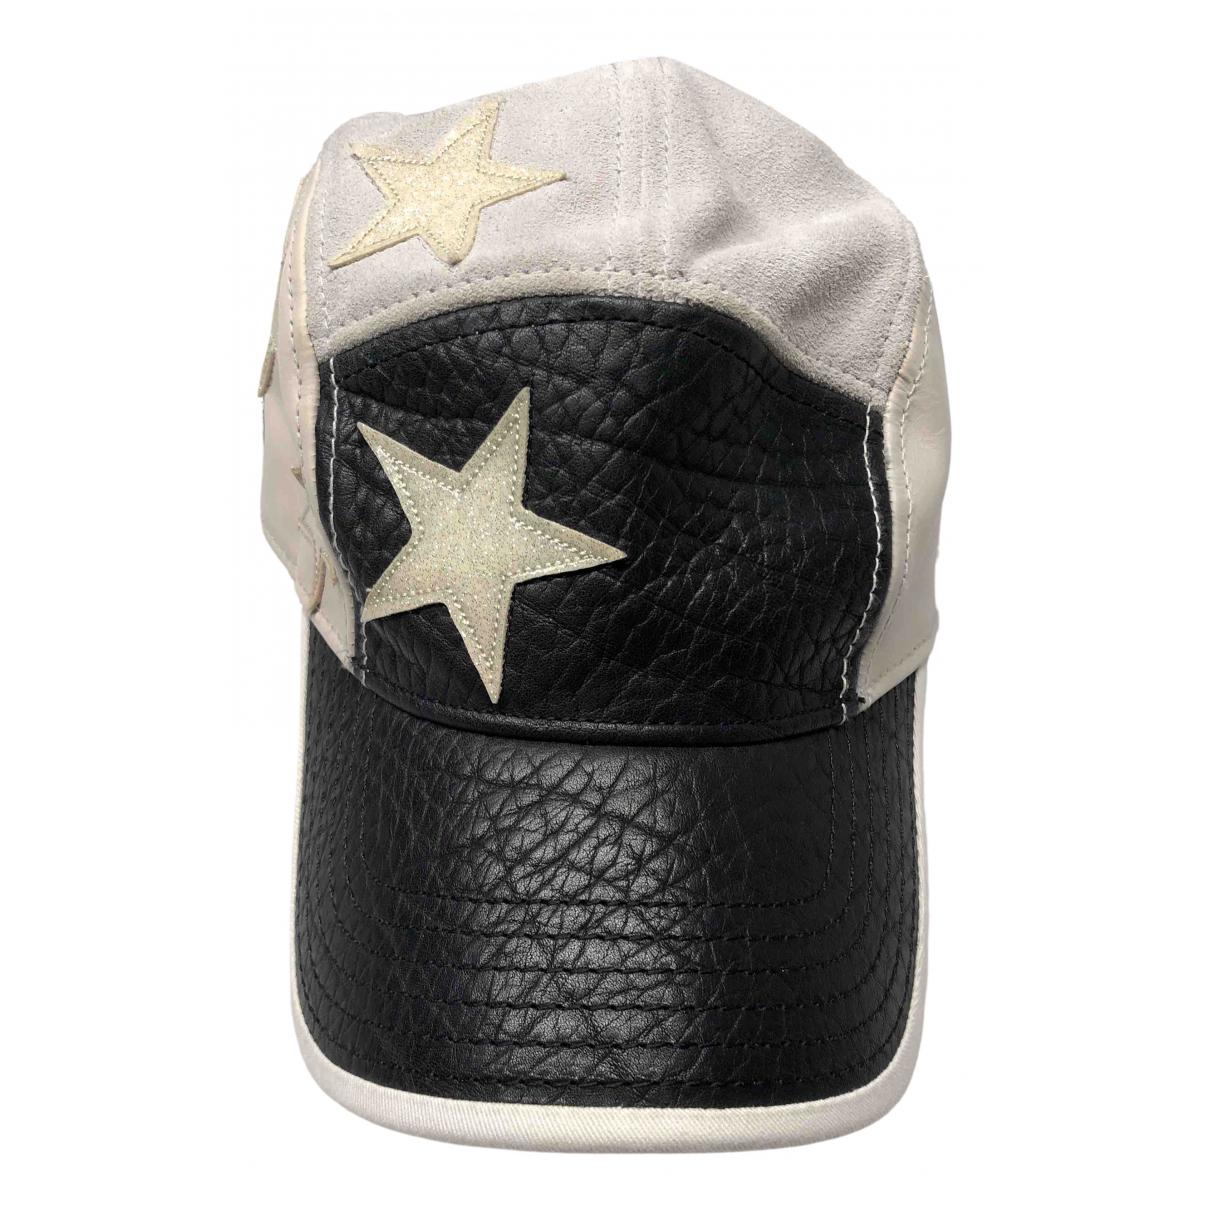 Acne Studios grey Leather Hats